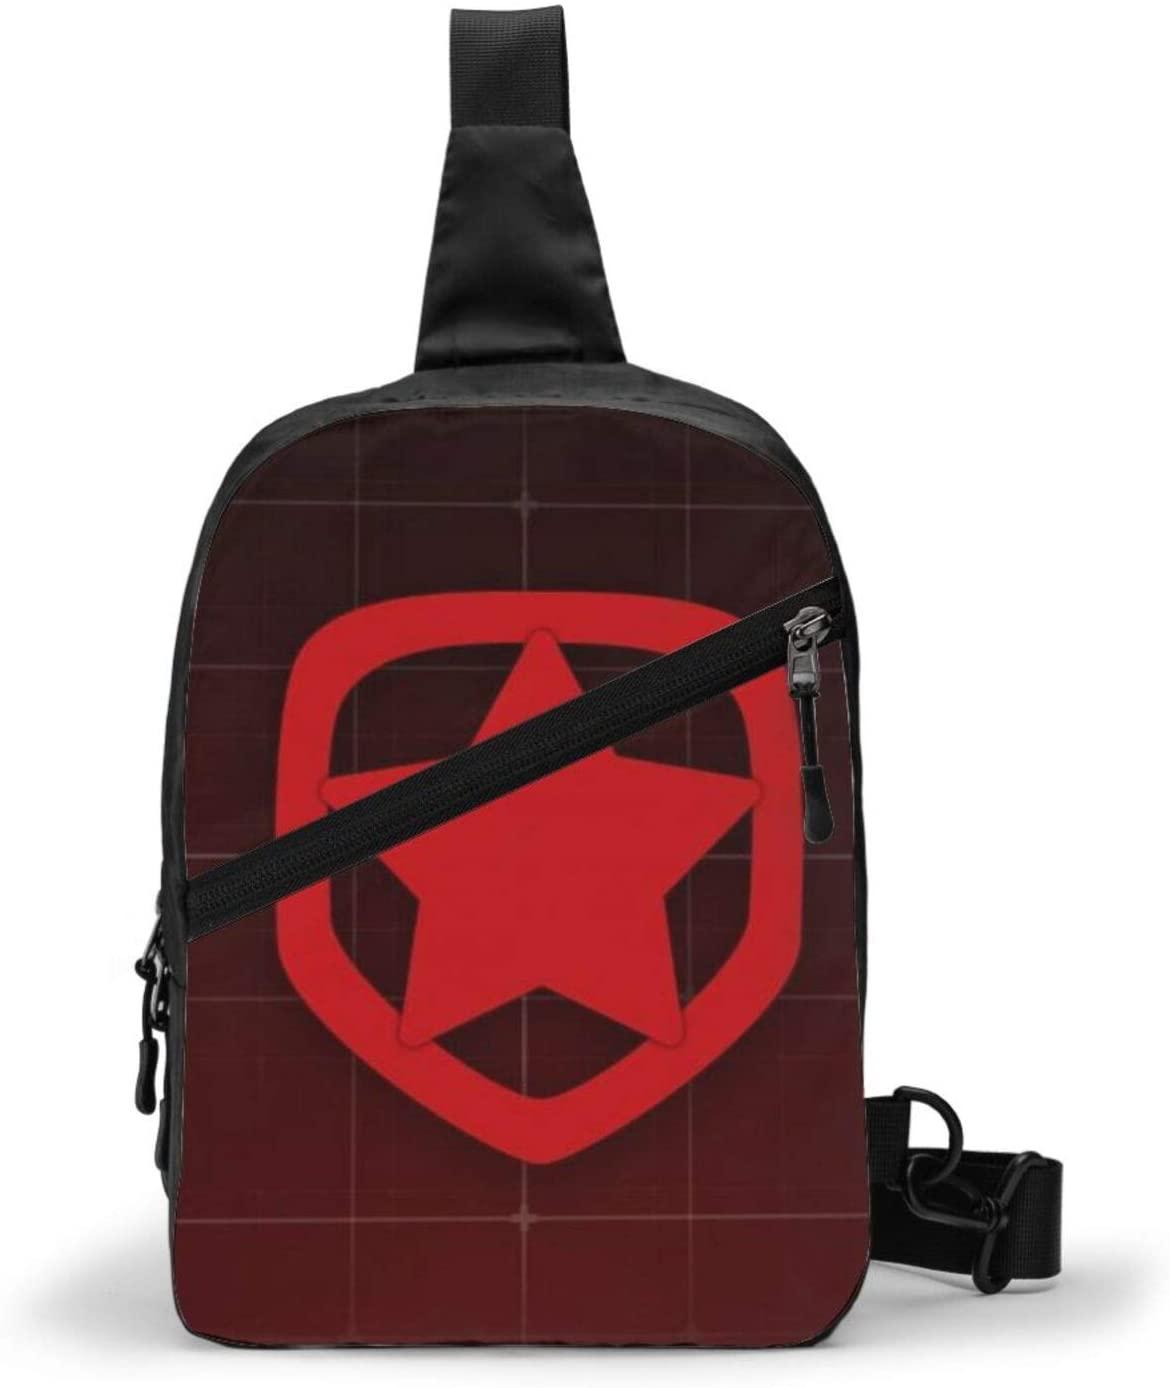 Sonickingmall Csgo Gambit Youngsters Logo Chest Package Sling Bag Large Capacity Multipurpose Daypack Men Women Chest Shoulder Backpack Casual Crossbodytravel Hiking Vintage Chest Bag Daypacks